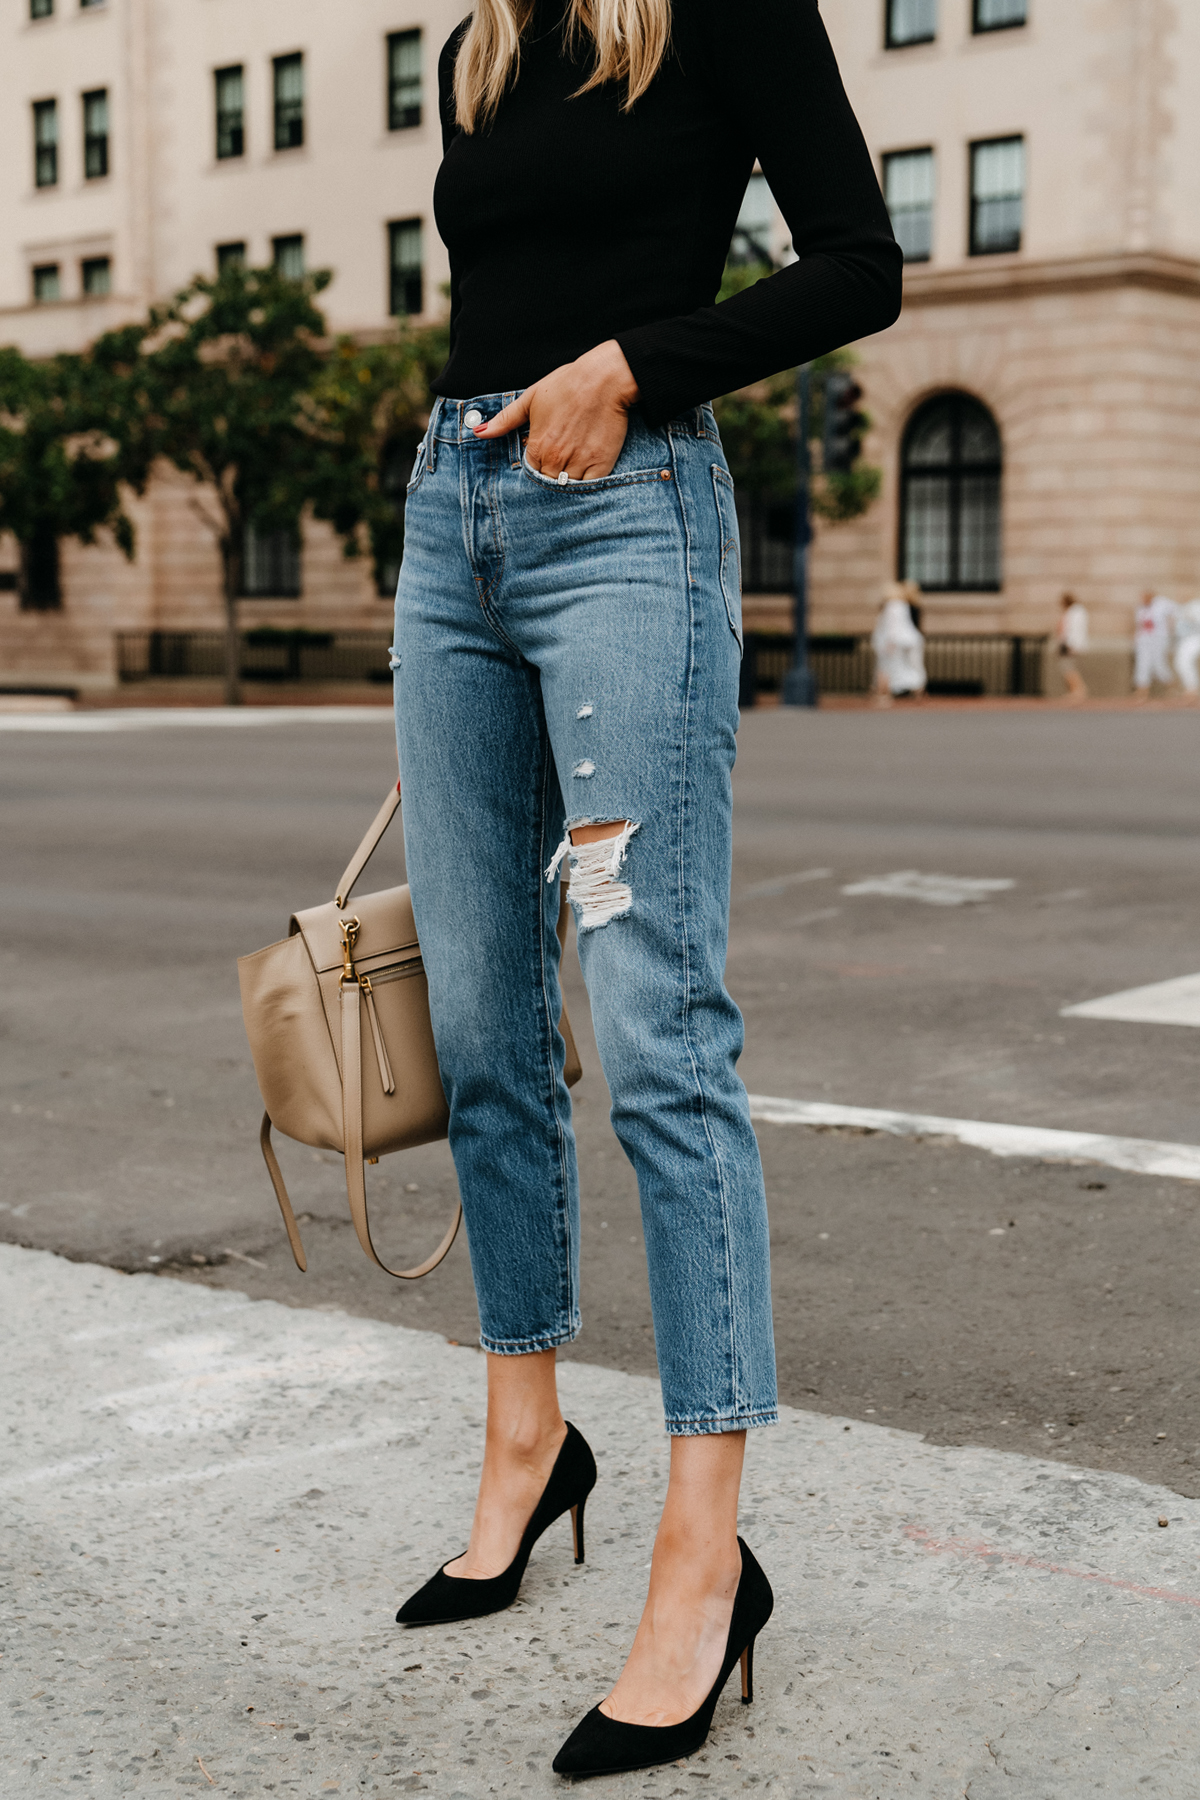 Fashion Jackson Wearing Black Bodysuit Levis Ripped Jeans Black Pumps